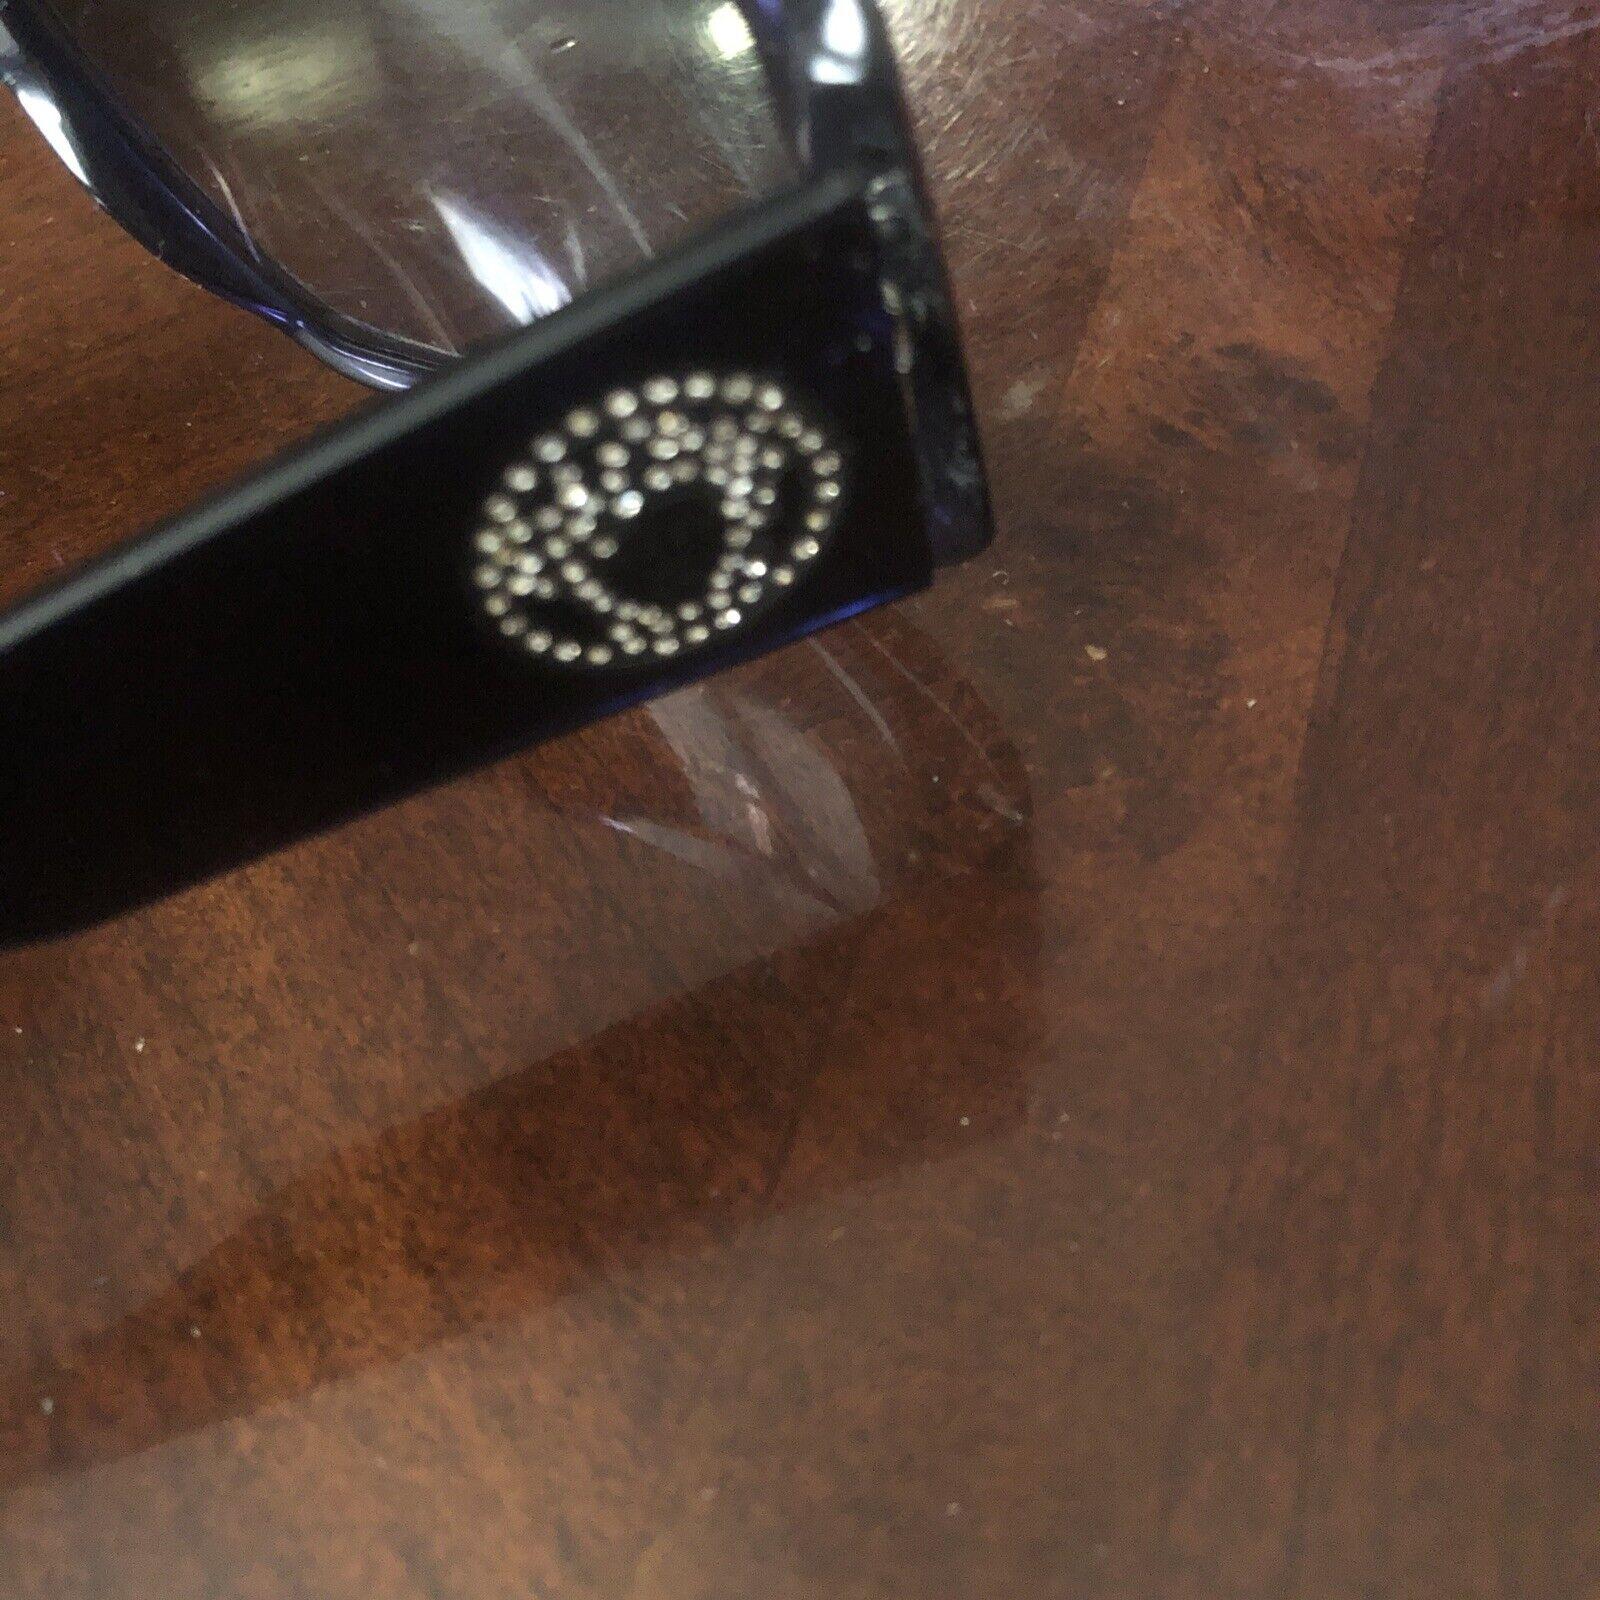 gianni versace sunglasses - image 4